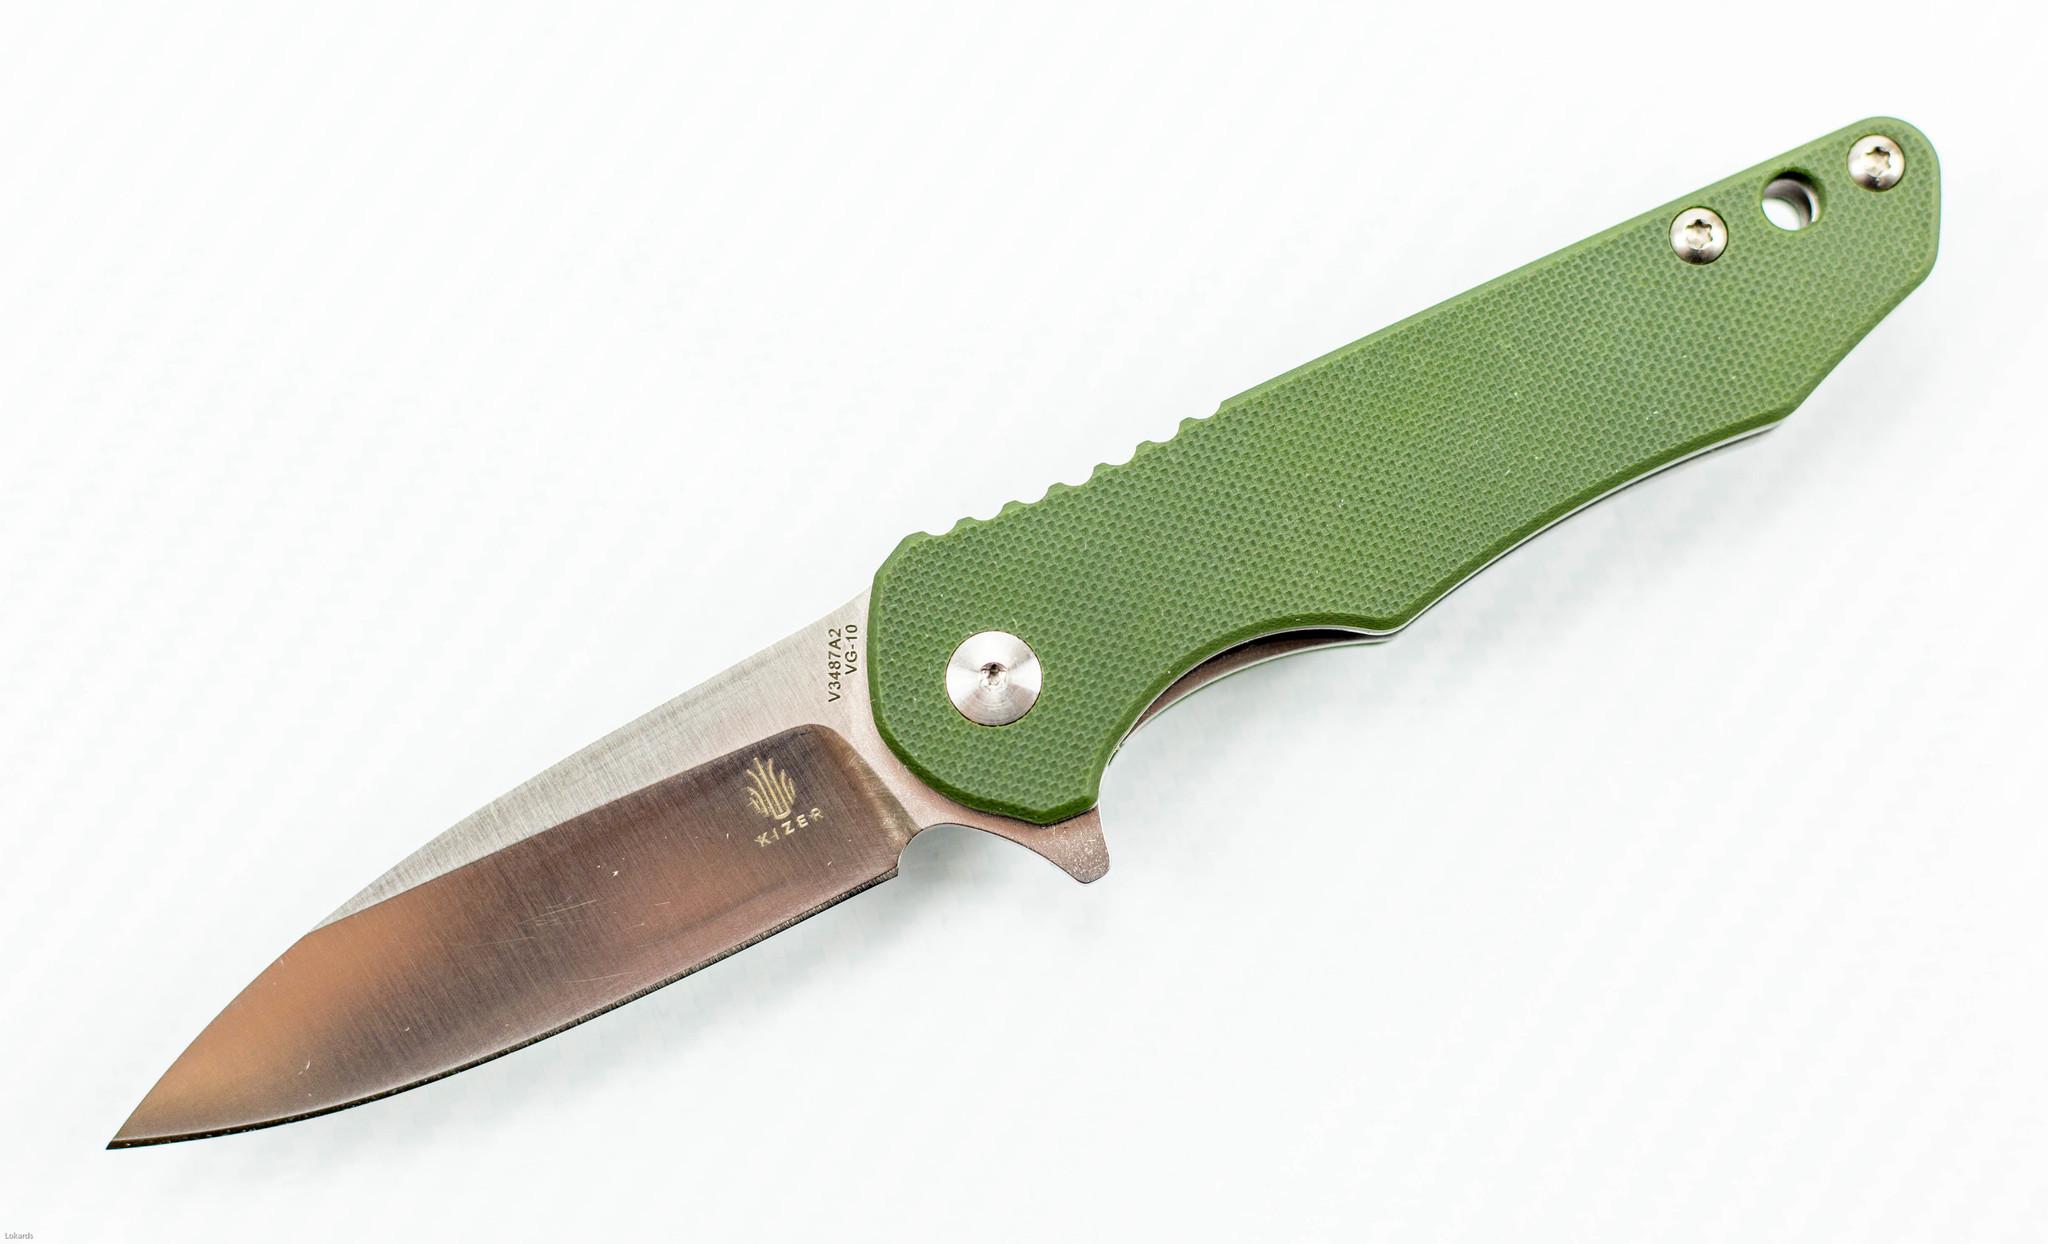 Складной нож Kizer Barbosa-2, сталь VG-10, рукоять G10